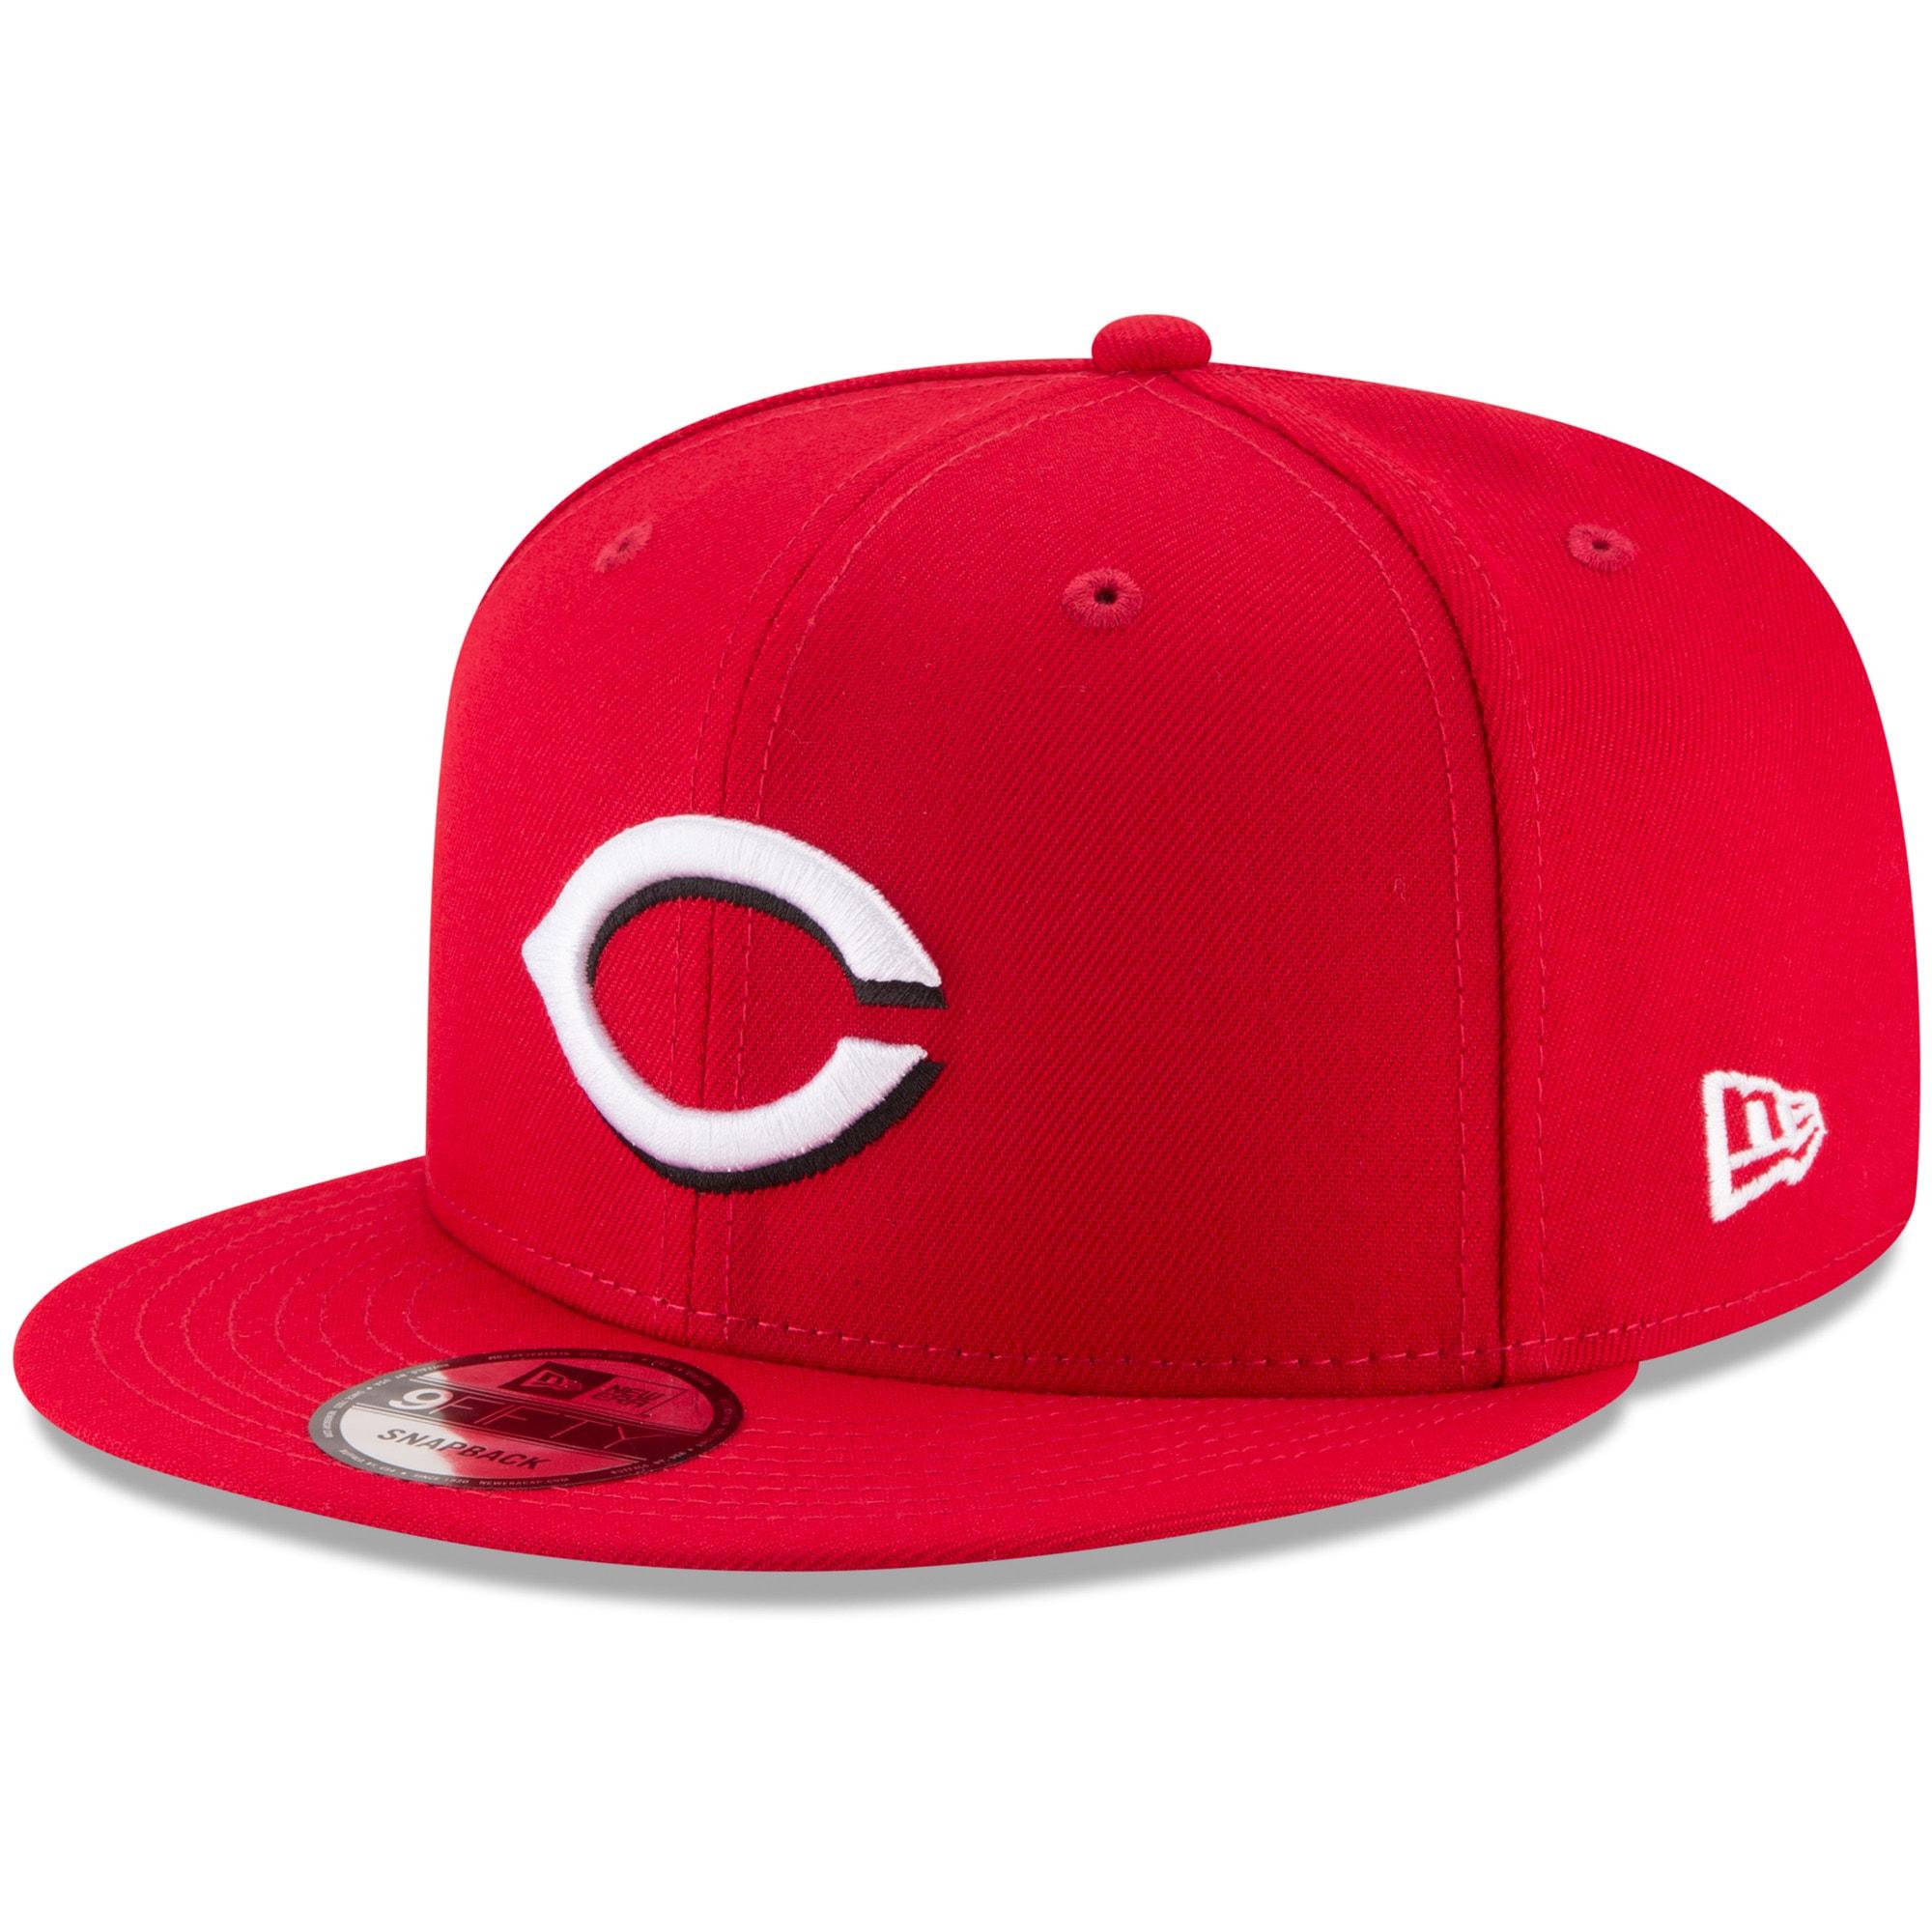 Cincinnati Reds New Era Team Color 9FIFTY Snapback Hat - Red